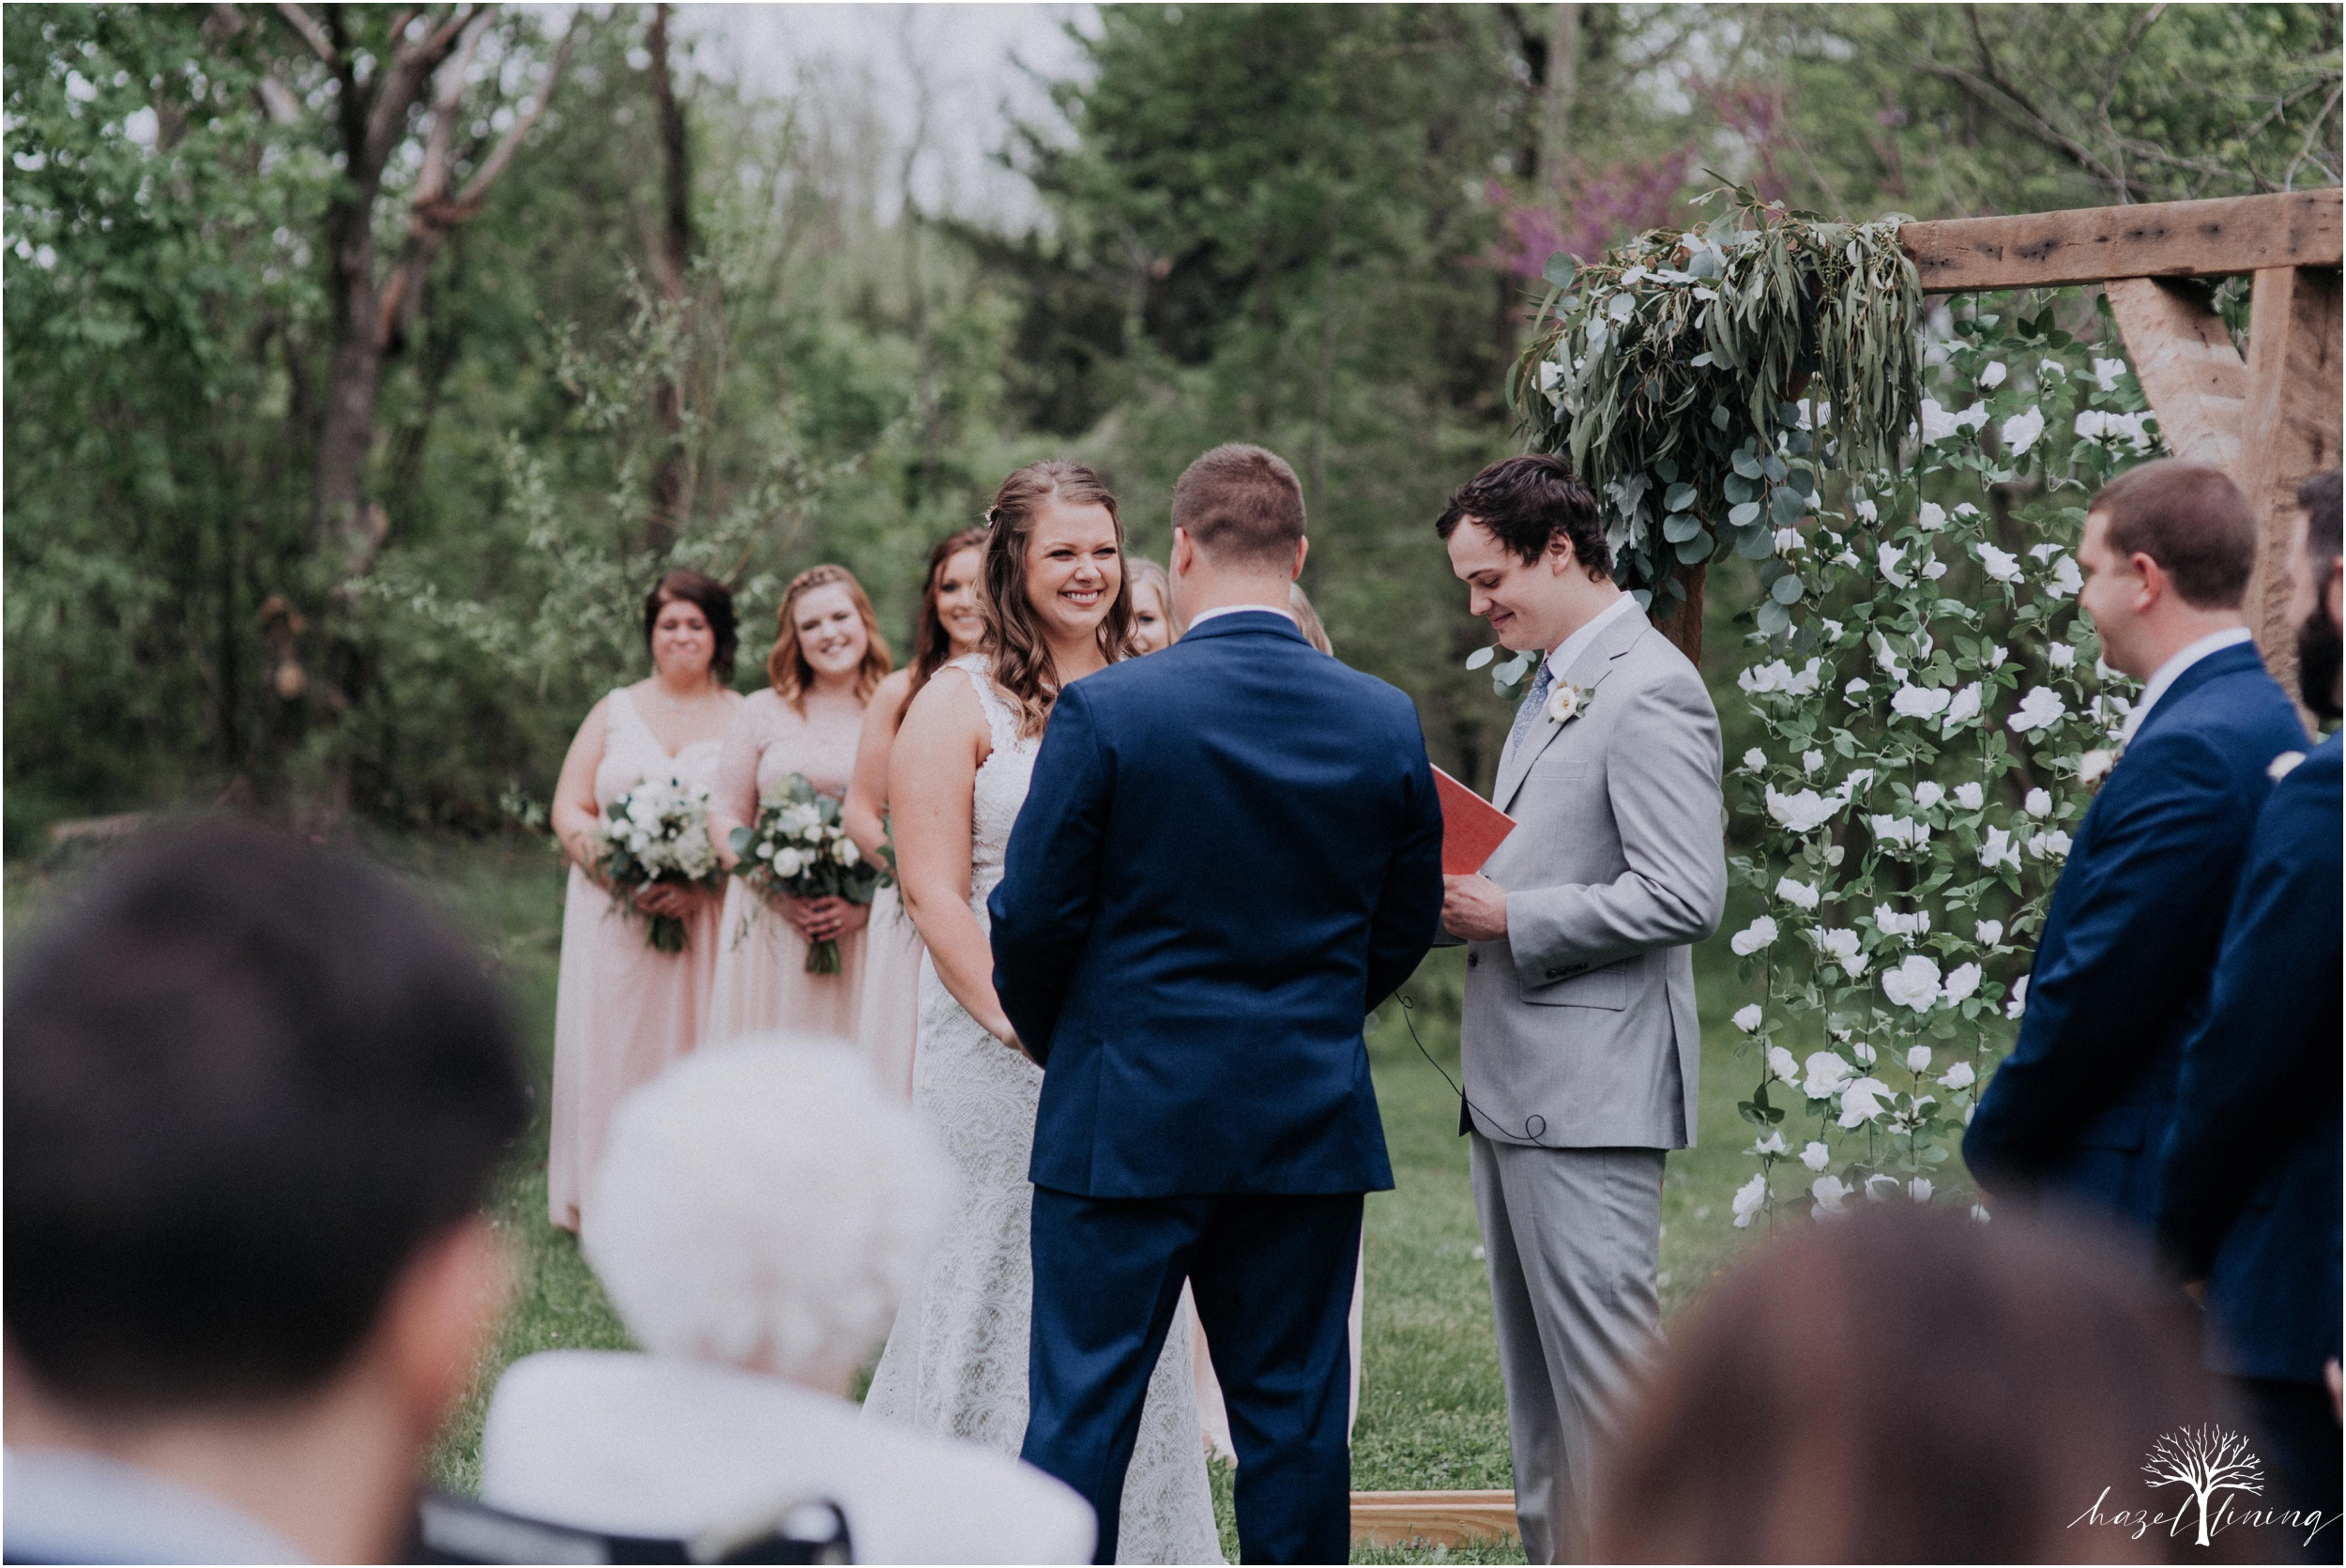 hazel-lining-travel-wedding-elopement-photography-abby-skyler-hunt-the-willis-house-york-pennsylvania-outdoor-estate-wedding_0087.jpg